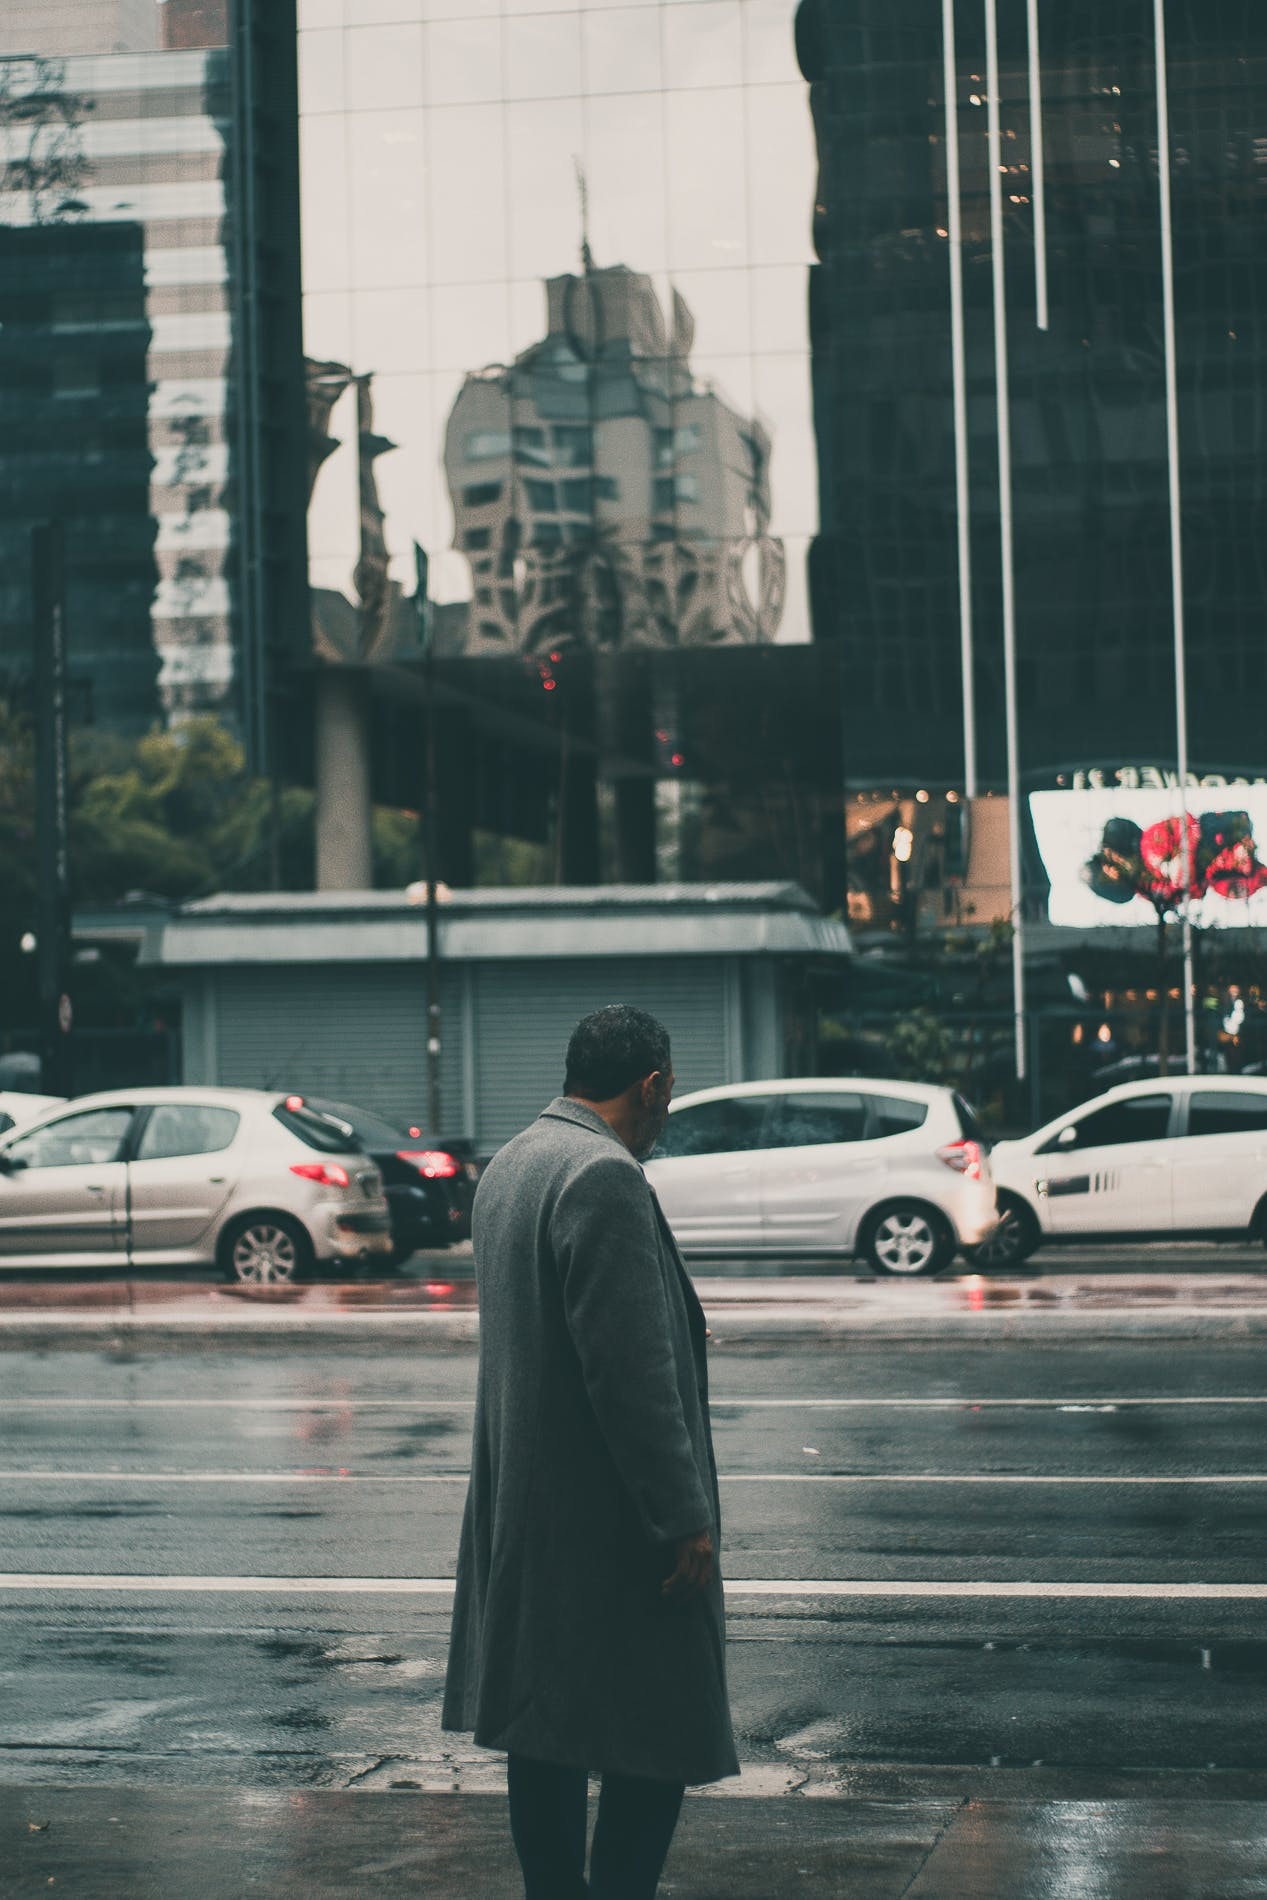 Man Wearing Black Coat Standing on Sidewalk